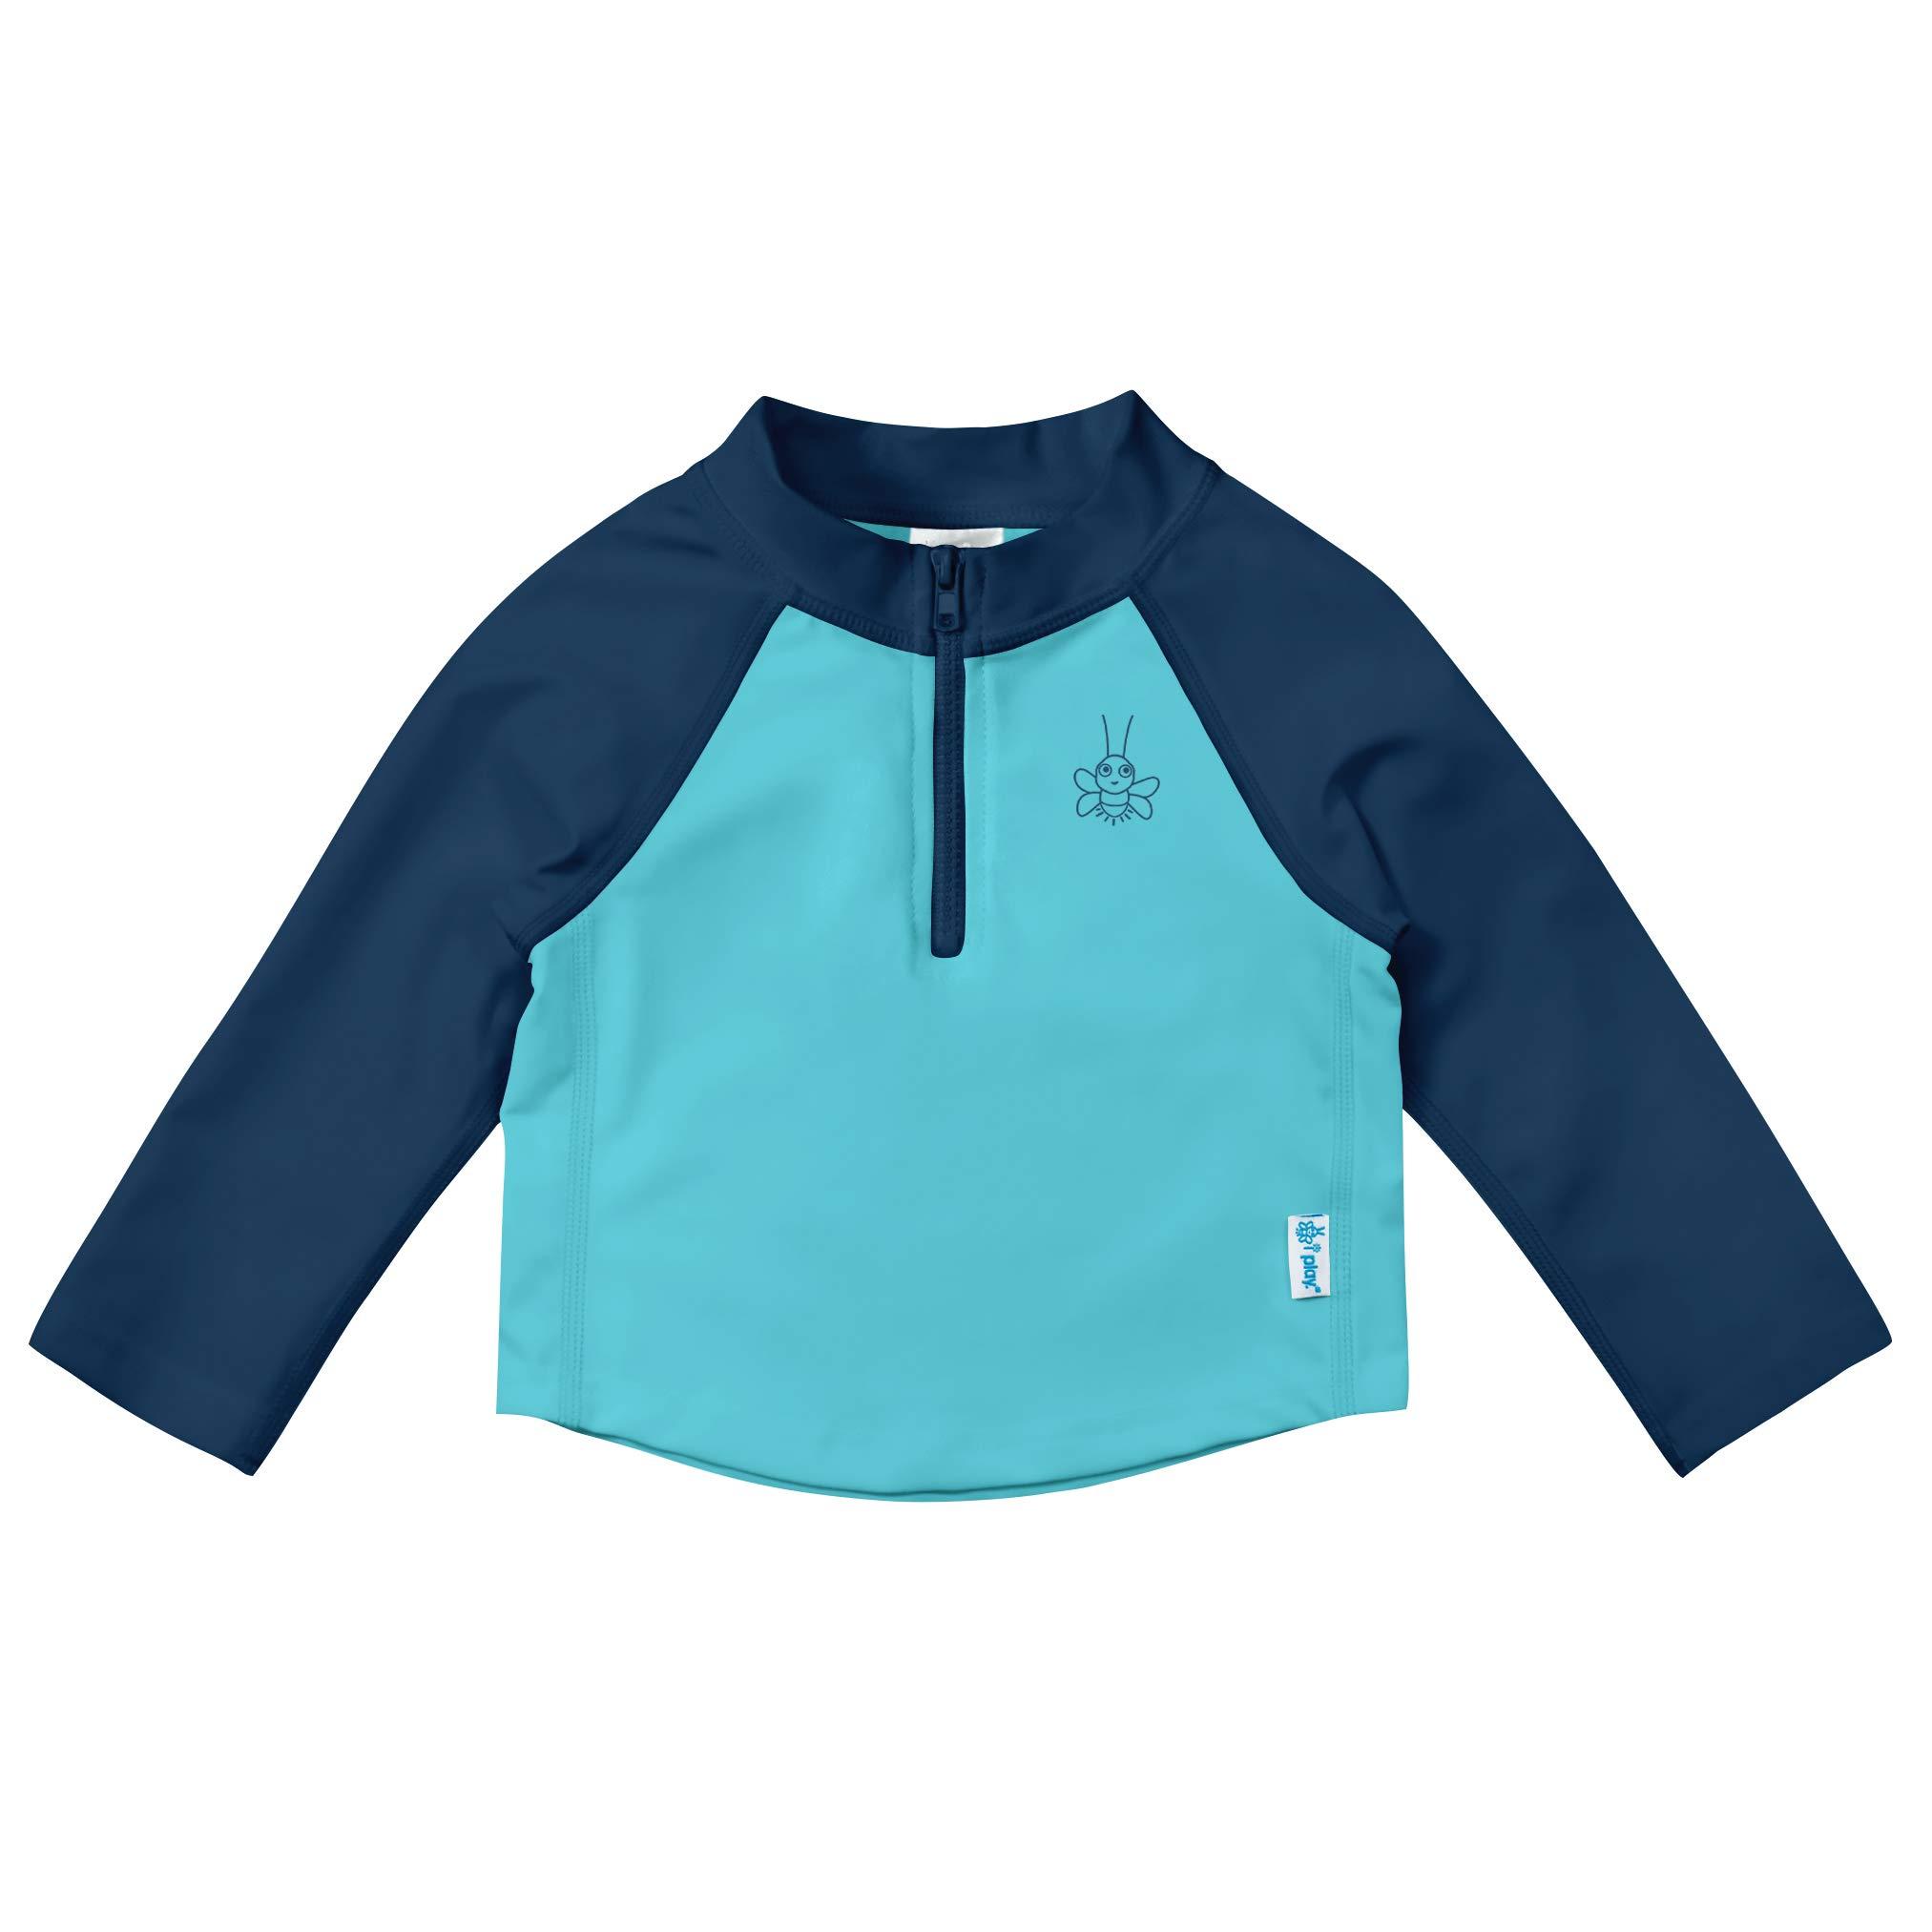 i play. Long Sleeve Rashguard Shirt | All-day UPF 50+ sun protection—wet or dry